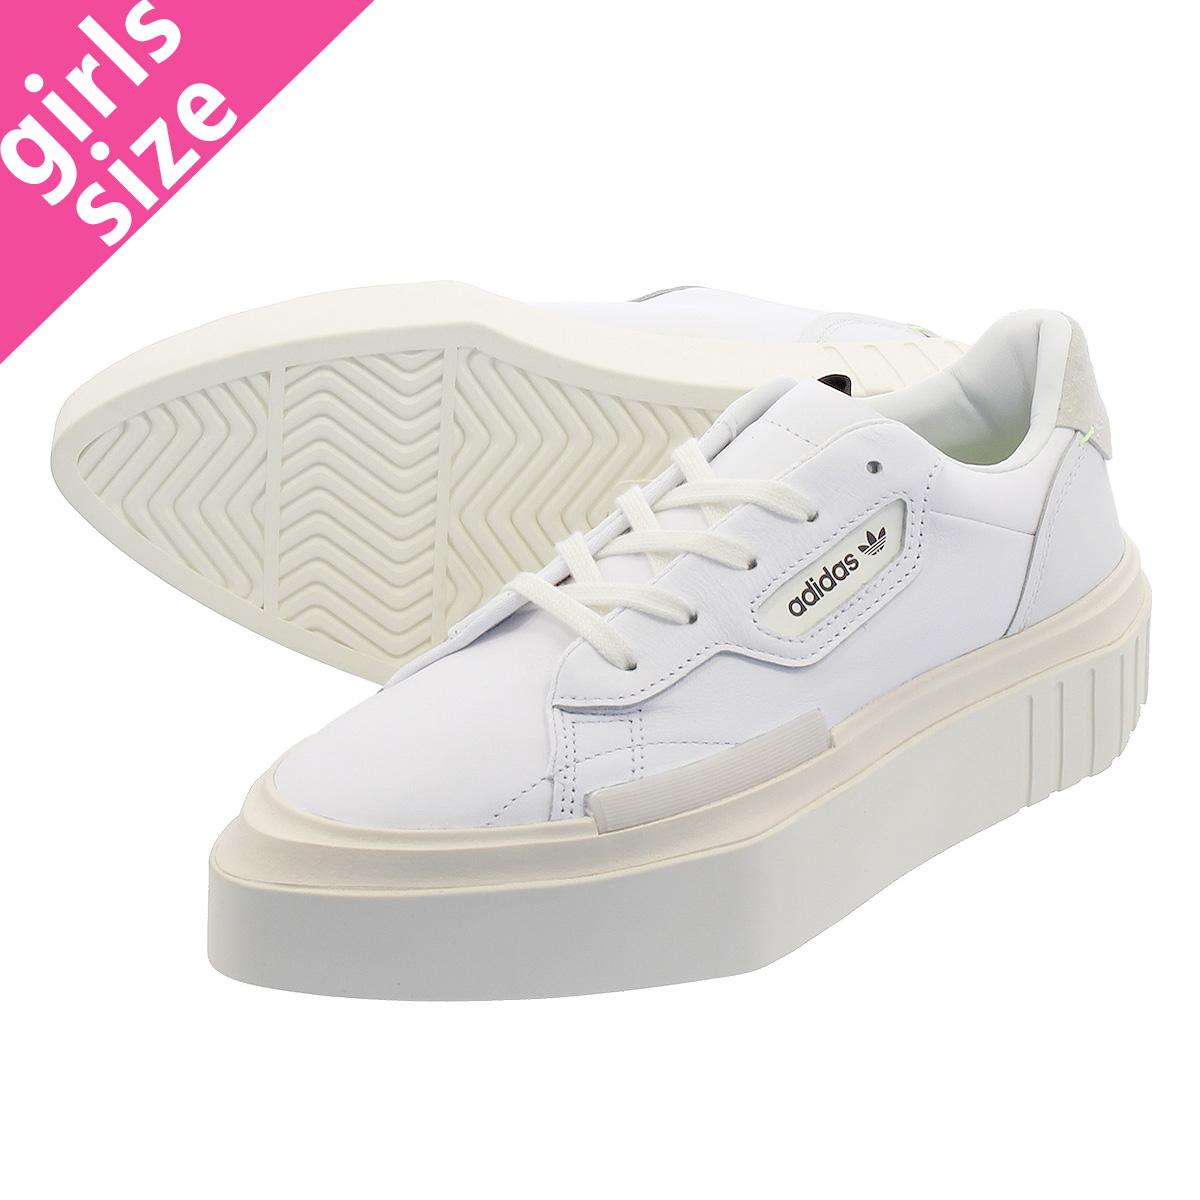 LOWTEX PLUS  adidas HYPERSLEEK W Adidas hyper leak women RUNNING WHITE OFF  WHITE CRYSTAL WHITE g54050  453a30e0a3